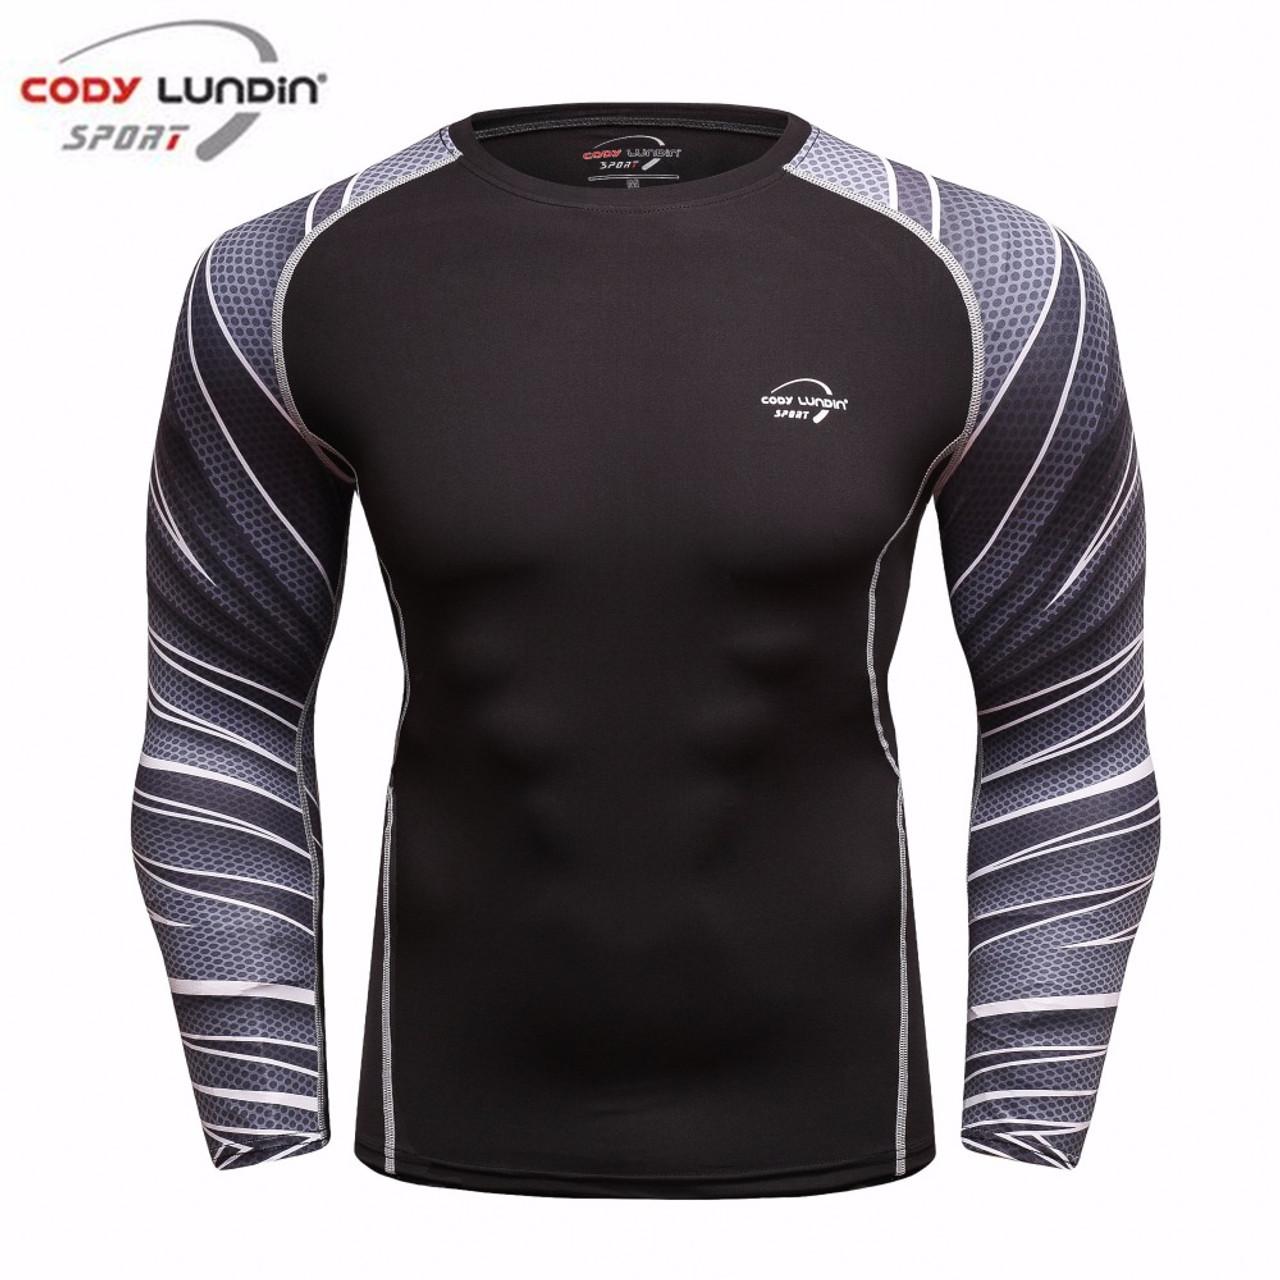 401c6e2f2032 Cody Lundin New 2018 Fitness MMA Compression Shirt Men Long Sleeve 3D  Printed T-shirt ...